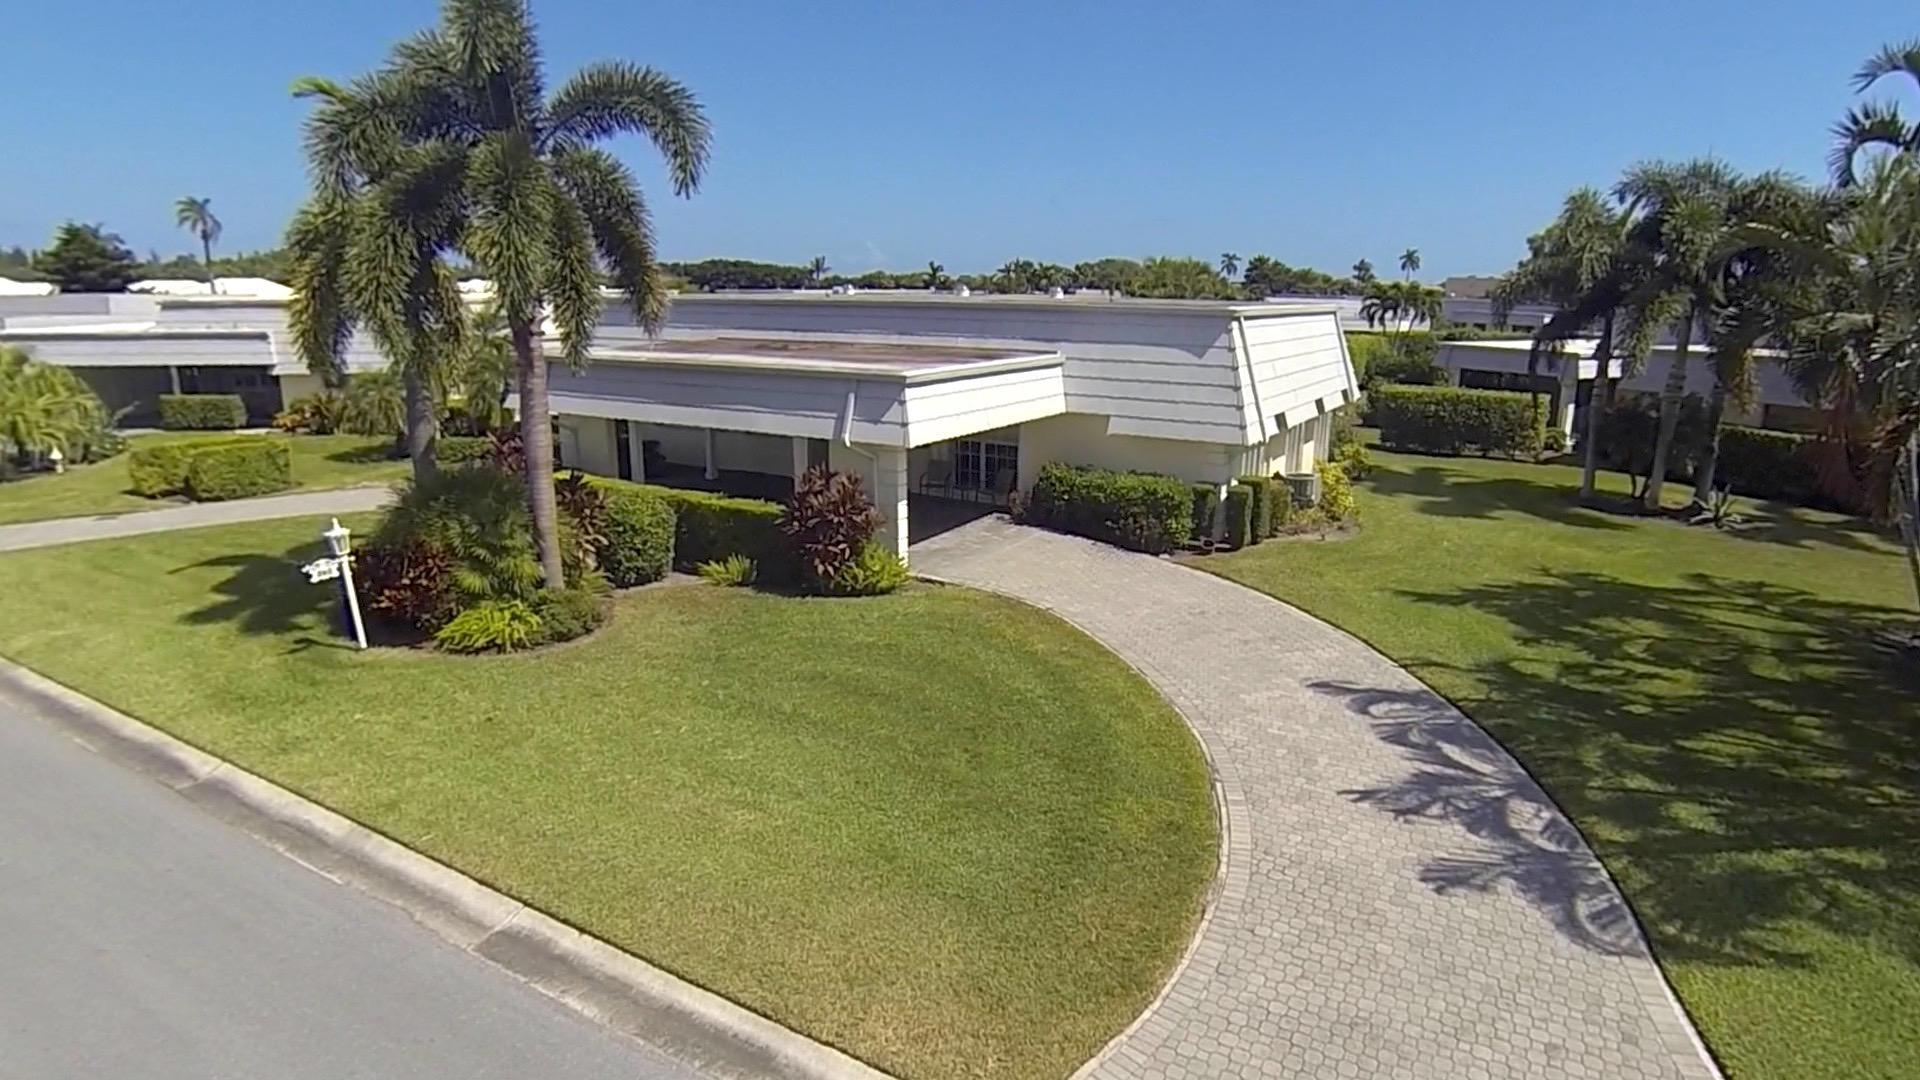 Photo of 392 Villa Drive Atlantis FL 33462 MLS RX-10471986